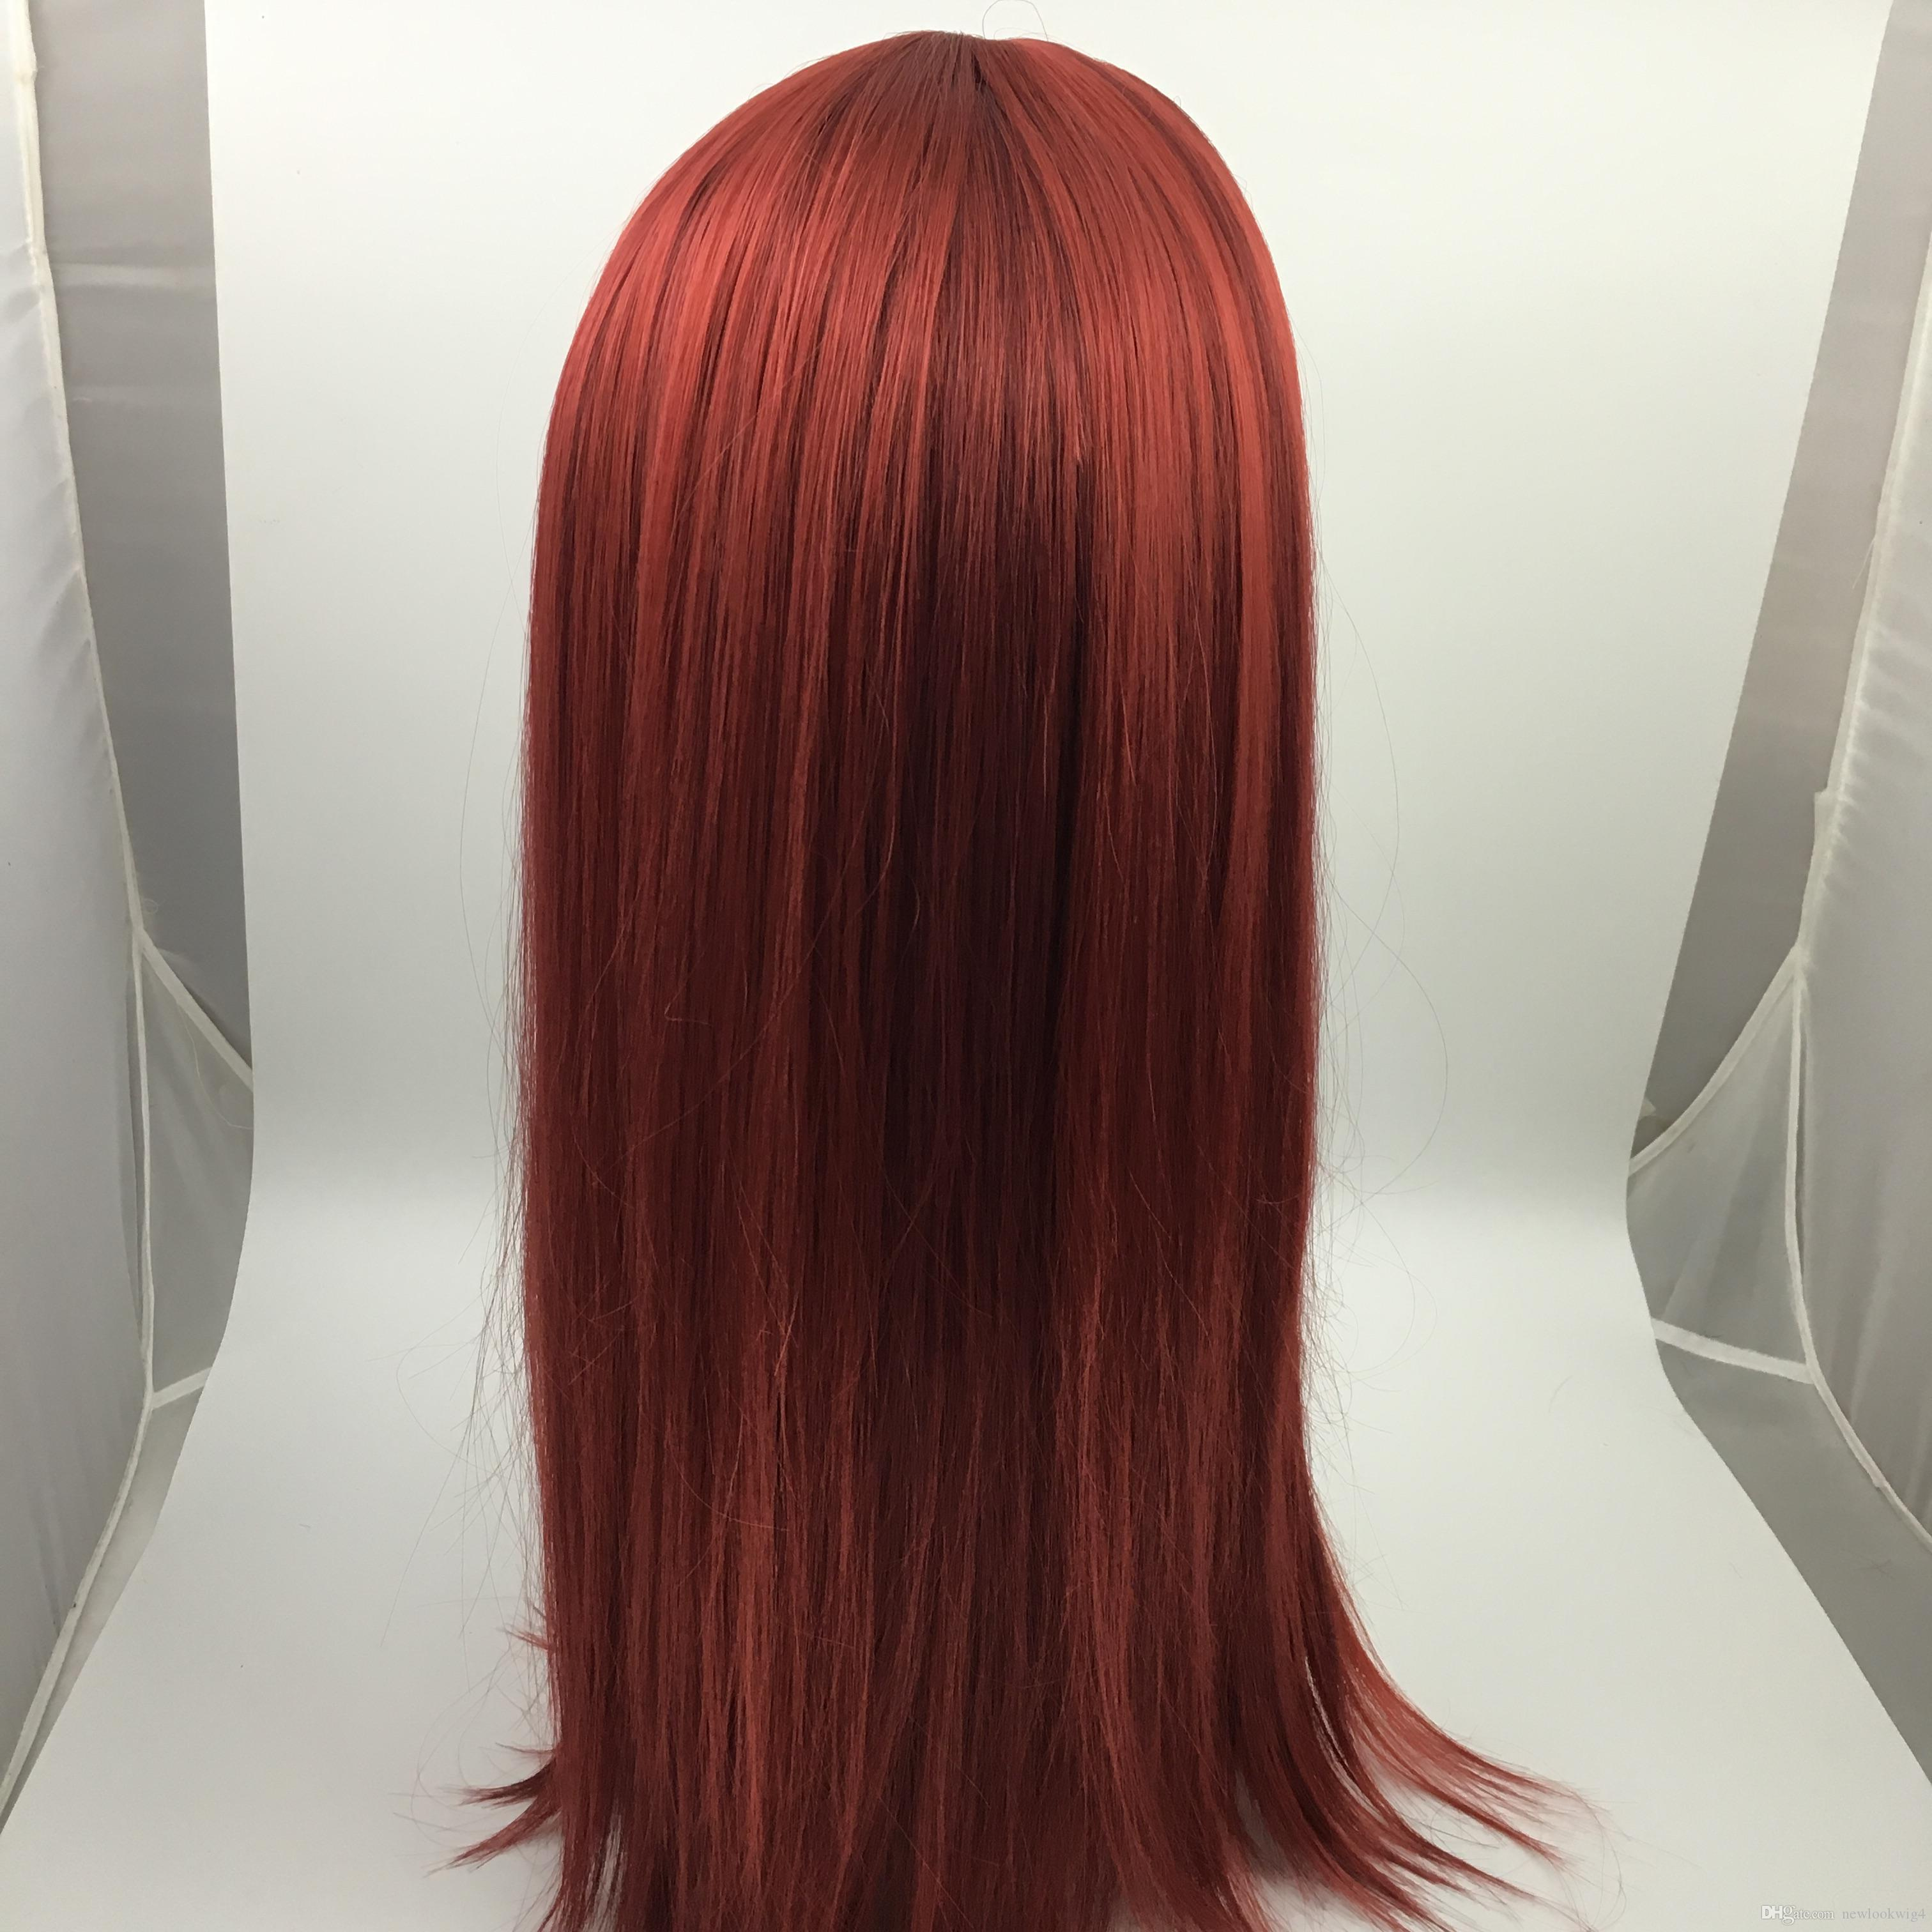 Exquisite Long Human Hair Wigs Cheap Files The haircut munity